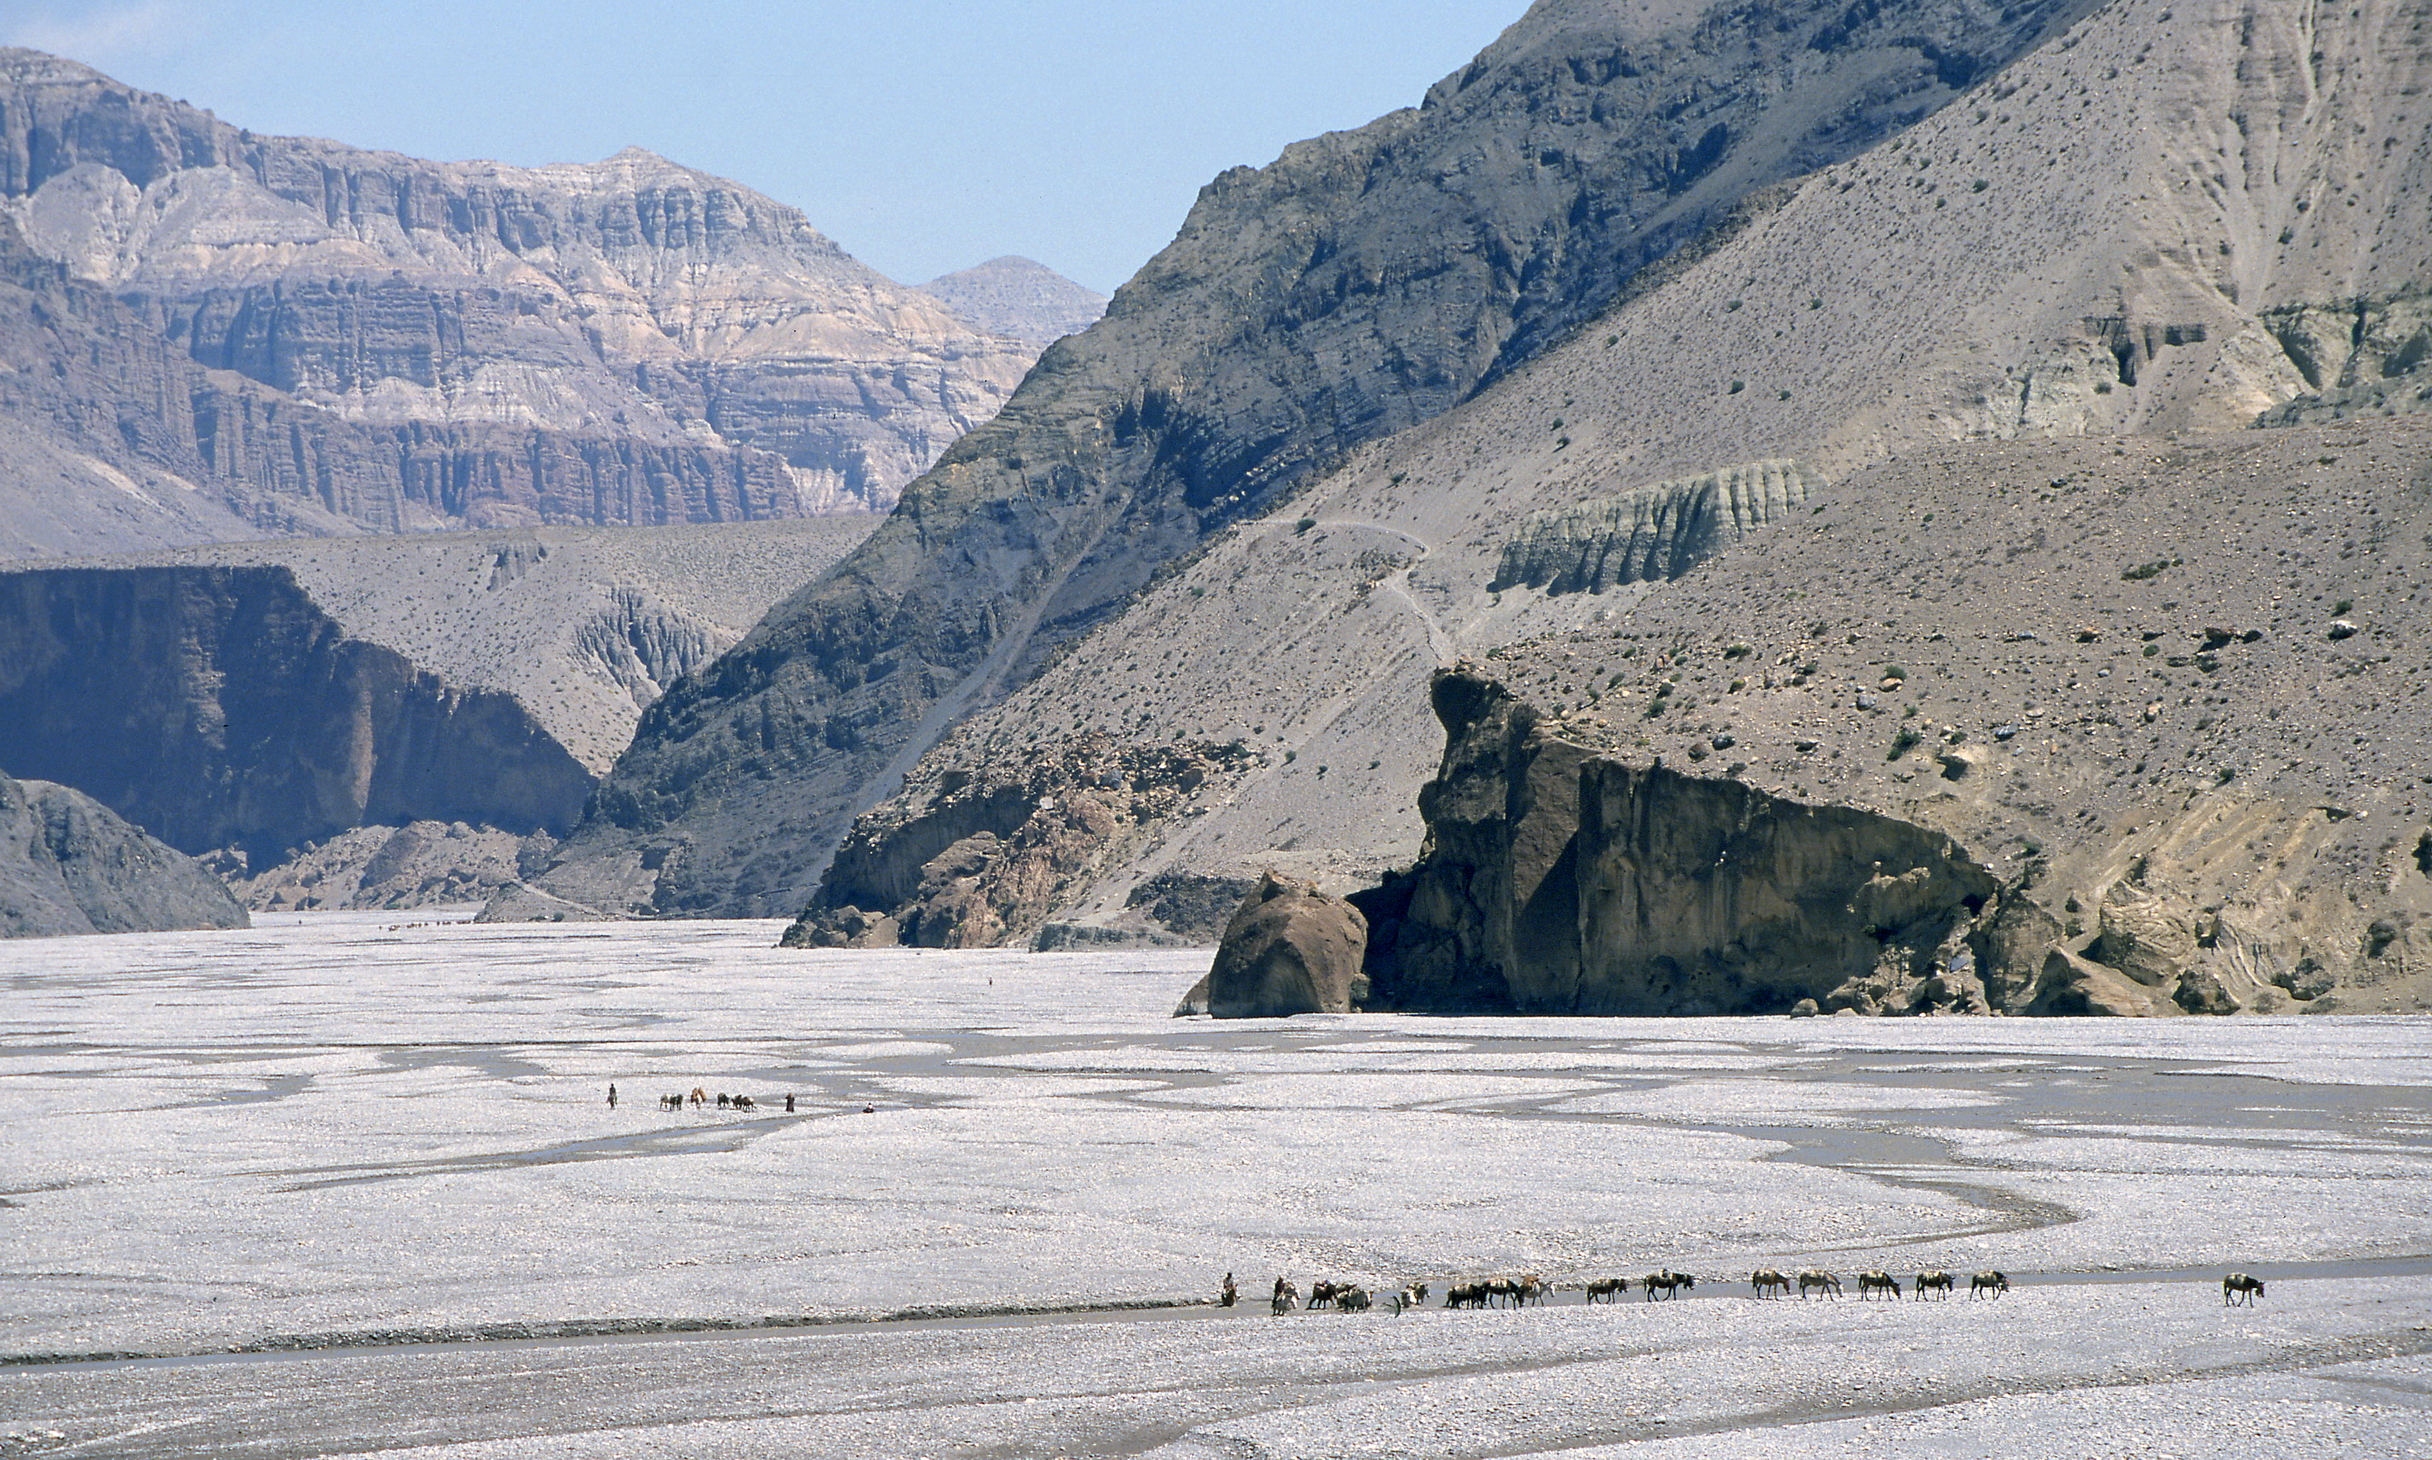 865-kali-Gandaki-carovana